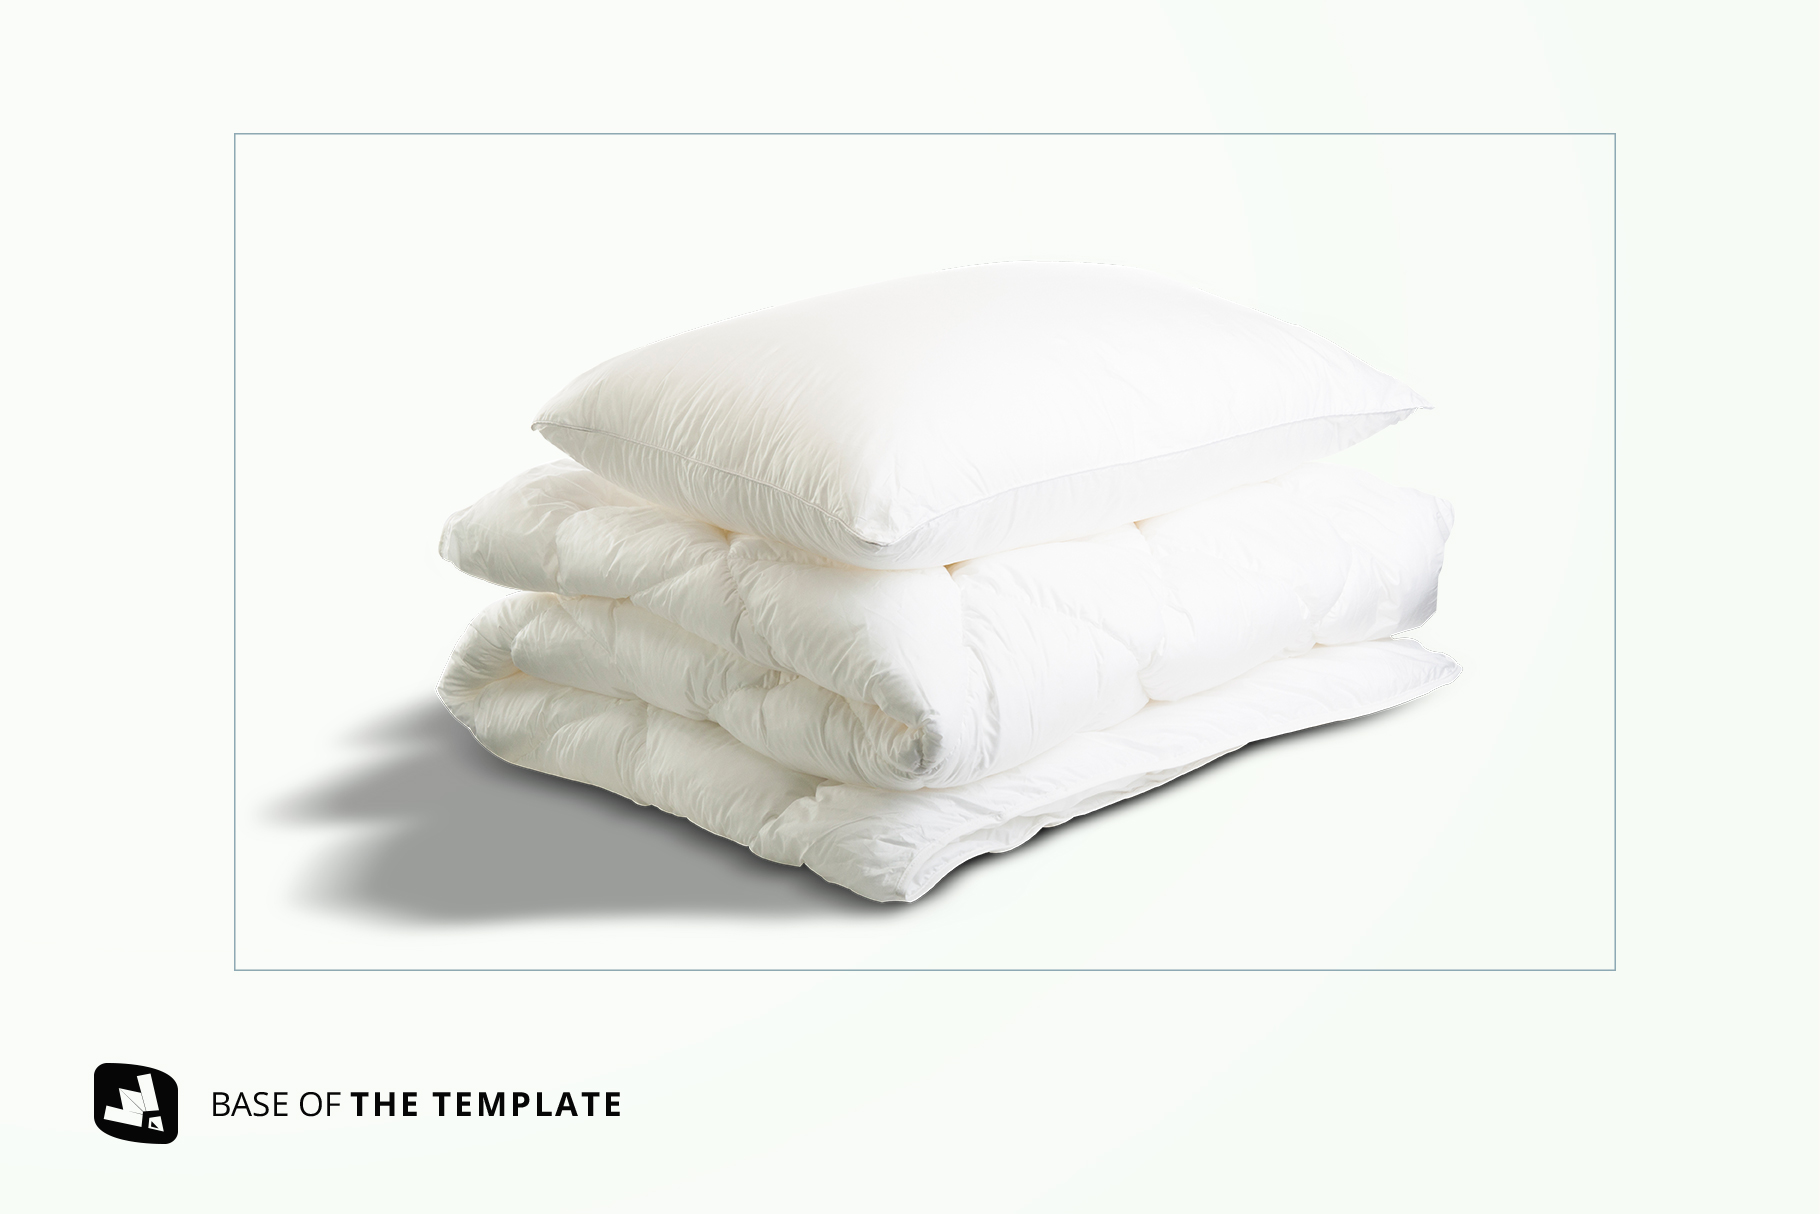 base image of the duvet & pillow case mockup